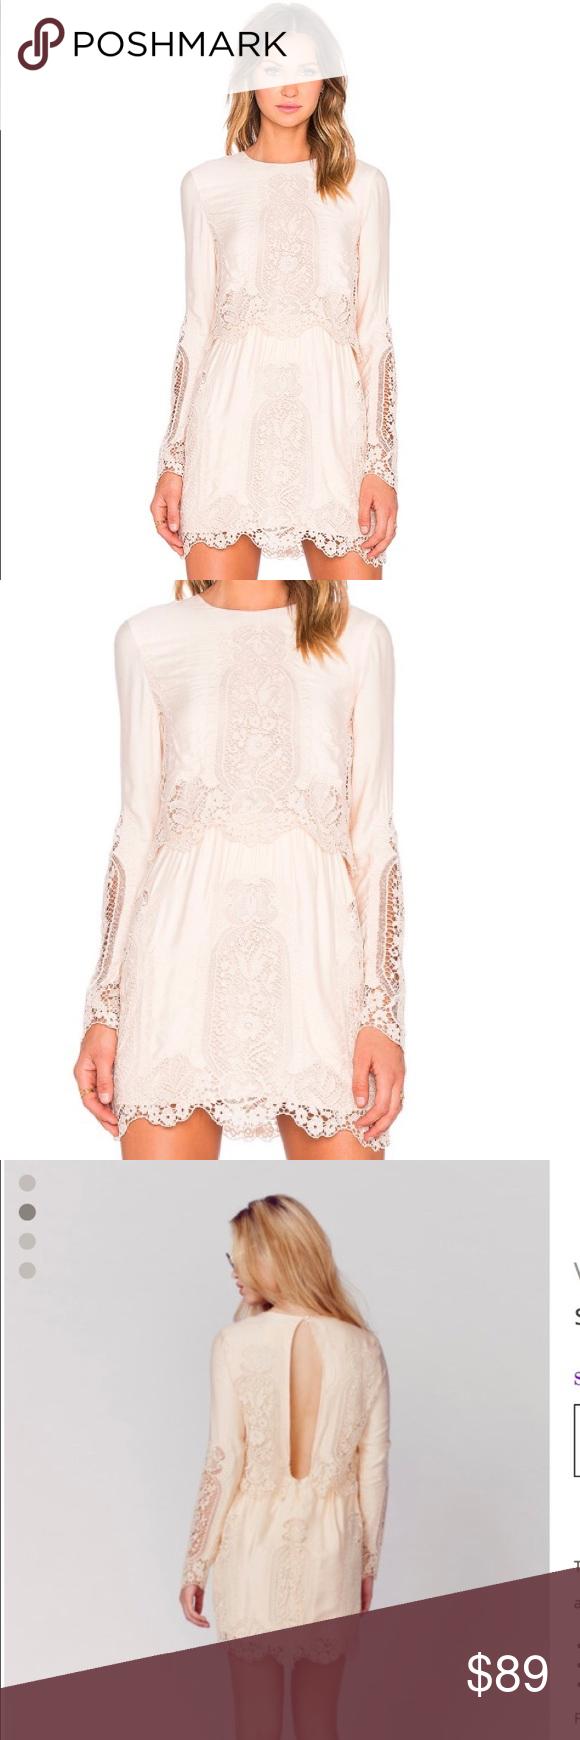 M boutique lace dress  NWT JETSET DIARIES FREE PEOPLE AVALON DRESSM Boutique  My Posh